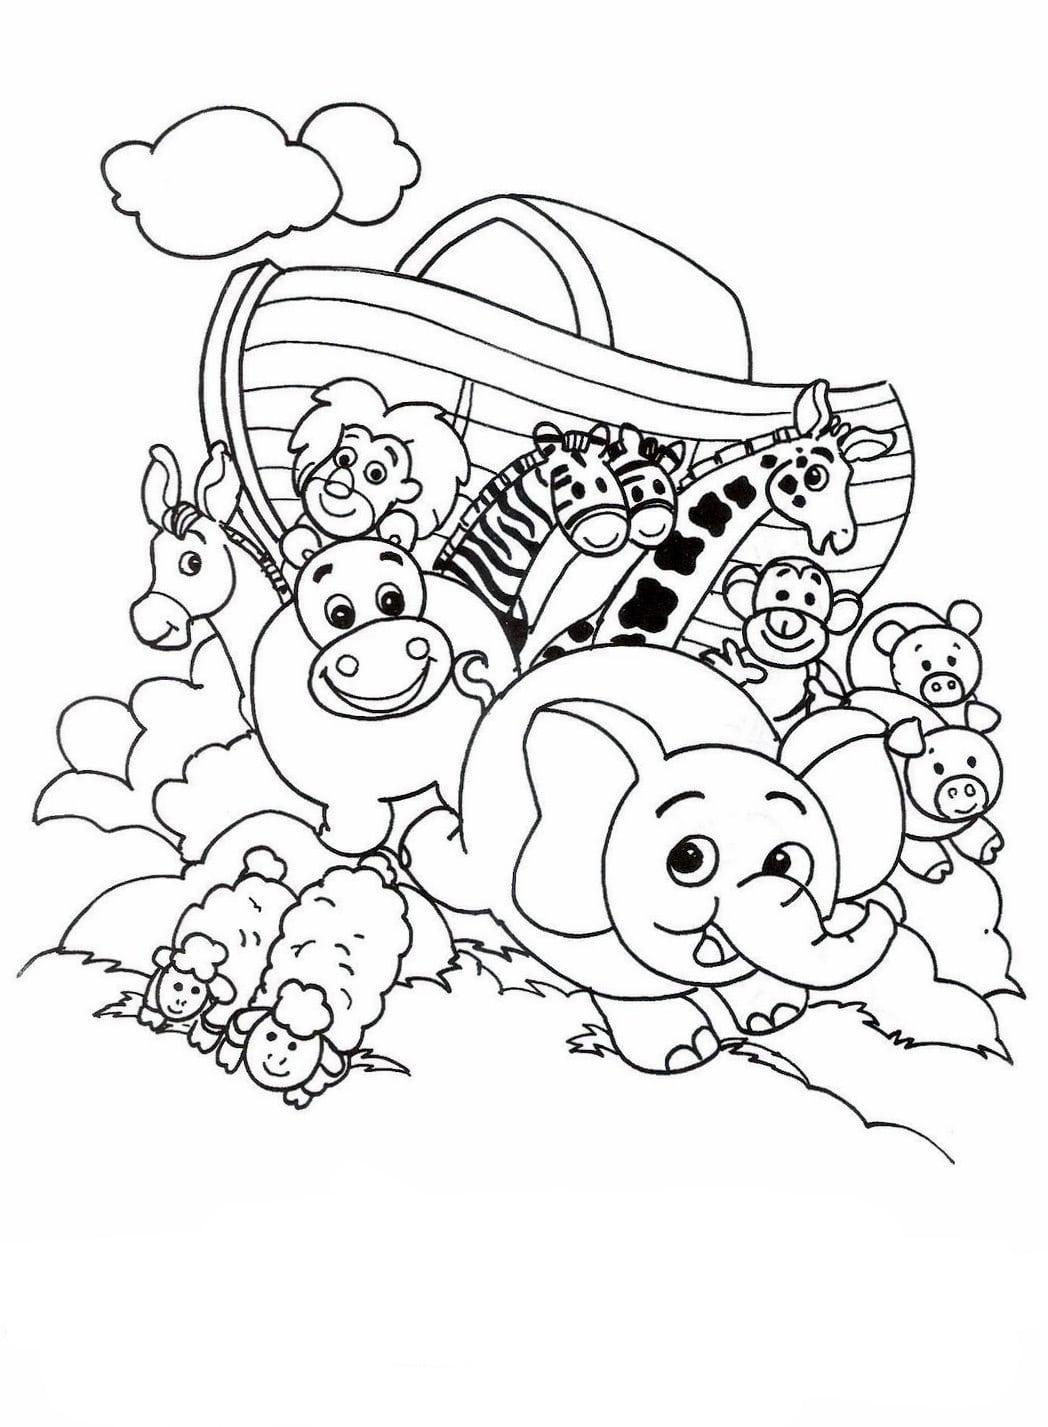 Desenhos De Arca De Noé Para Colorir